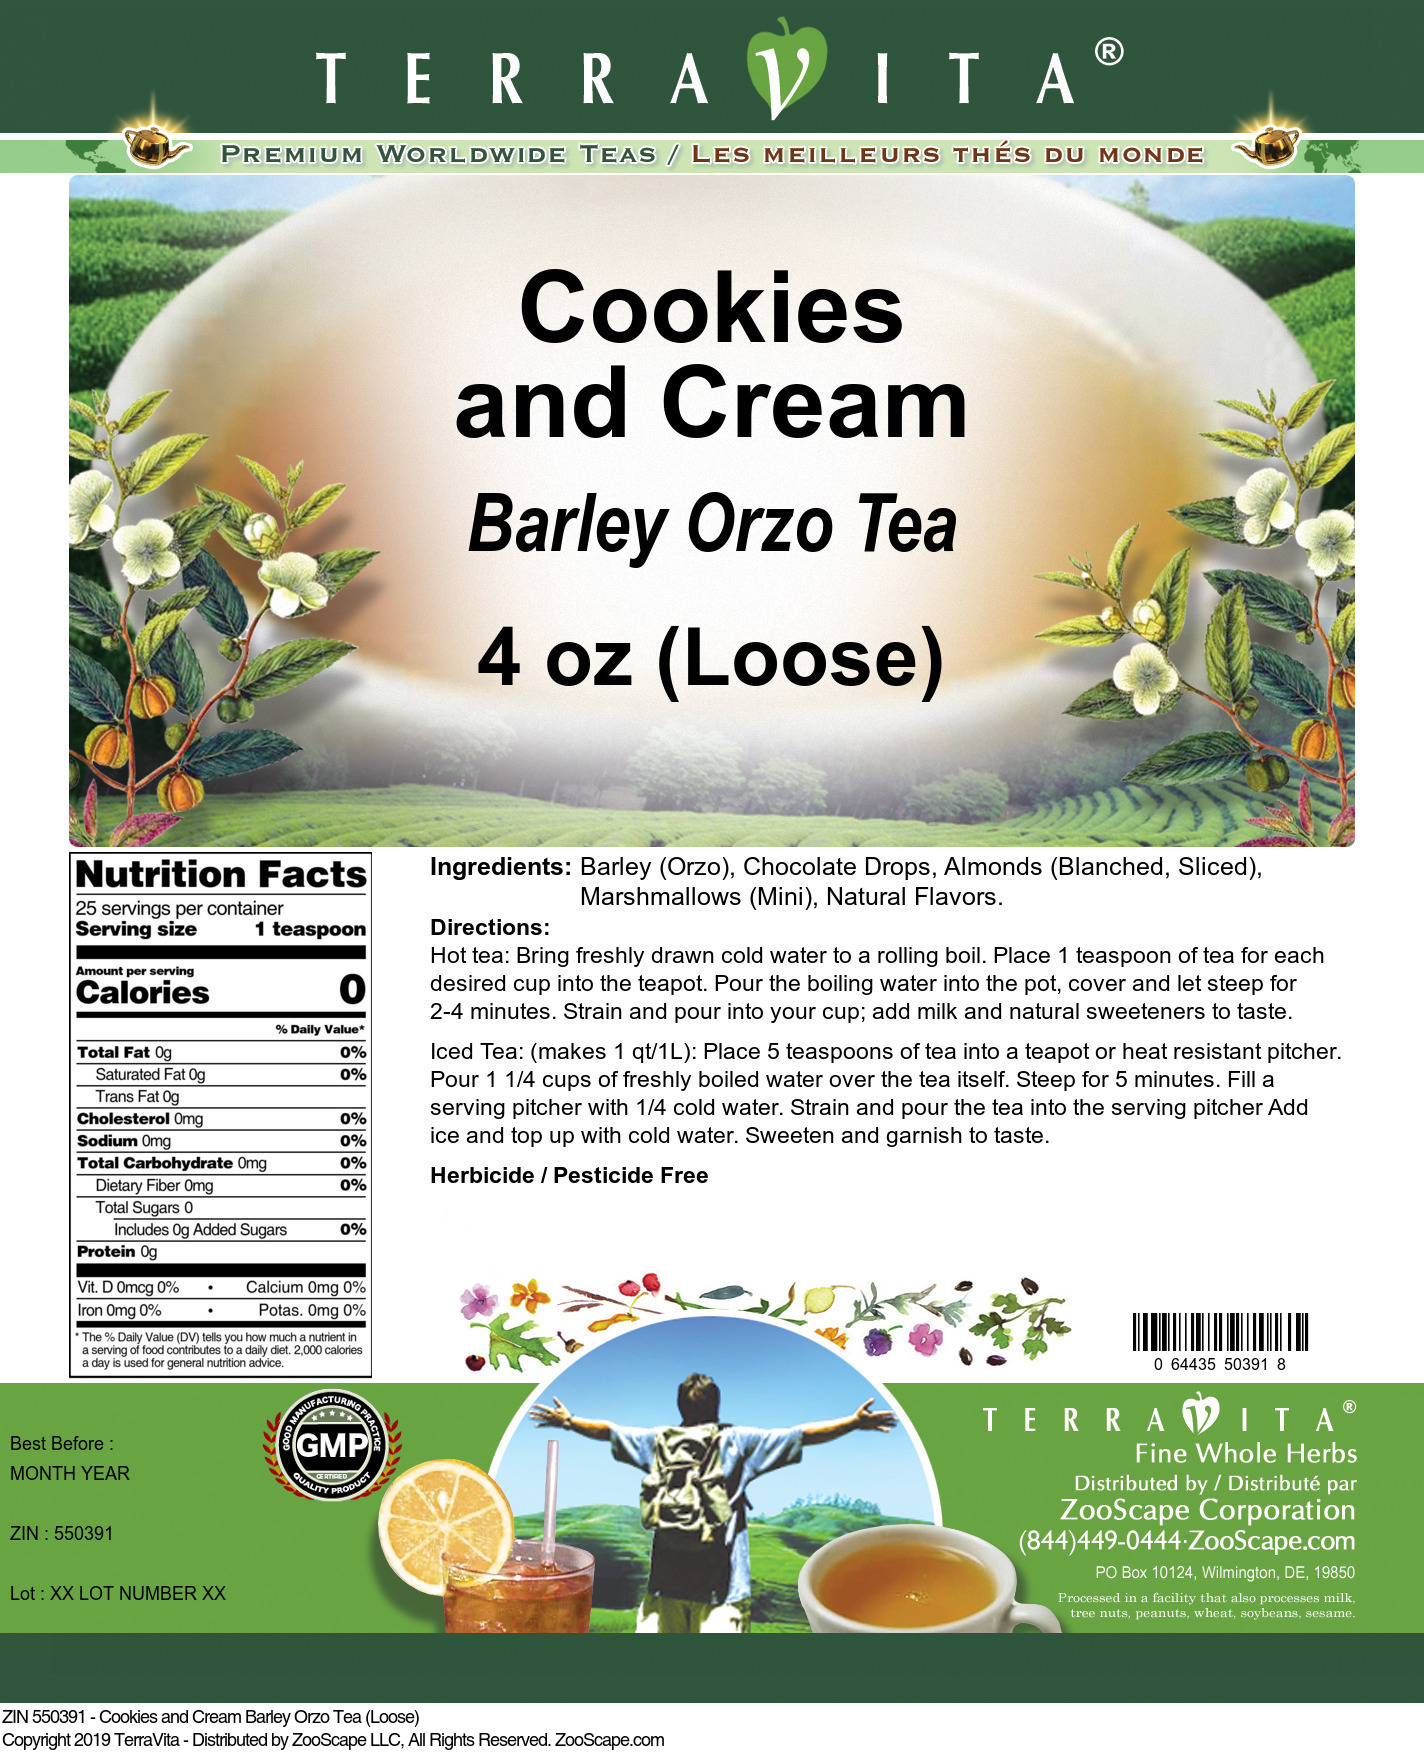 Cookies And Cream Barley Orzo